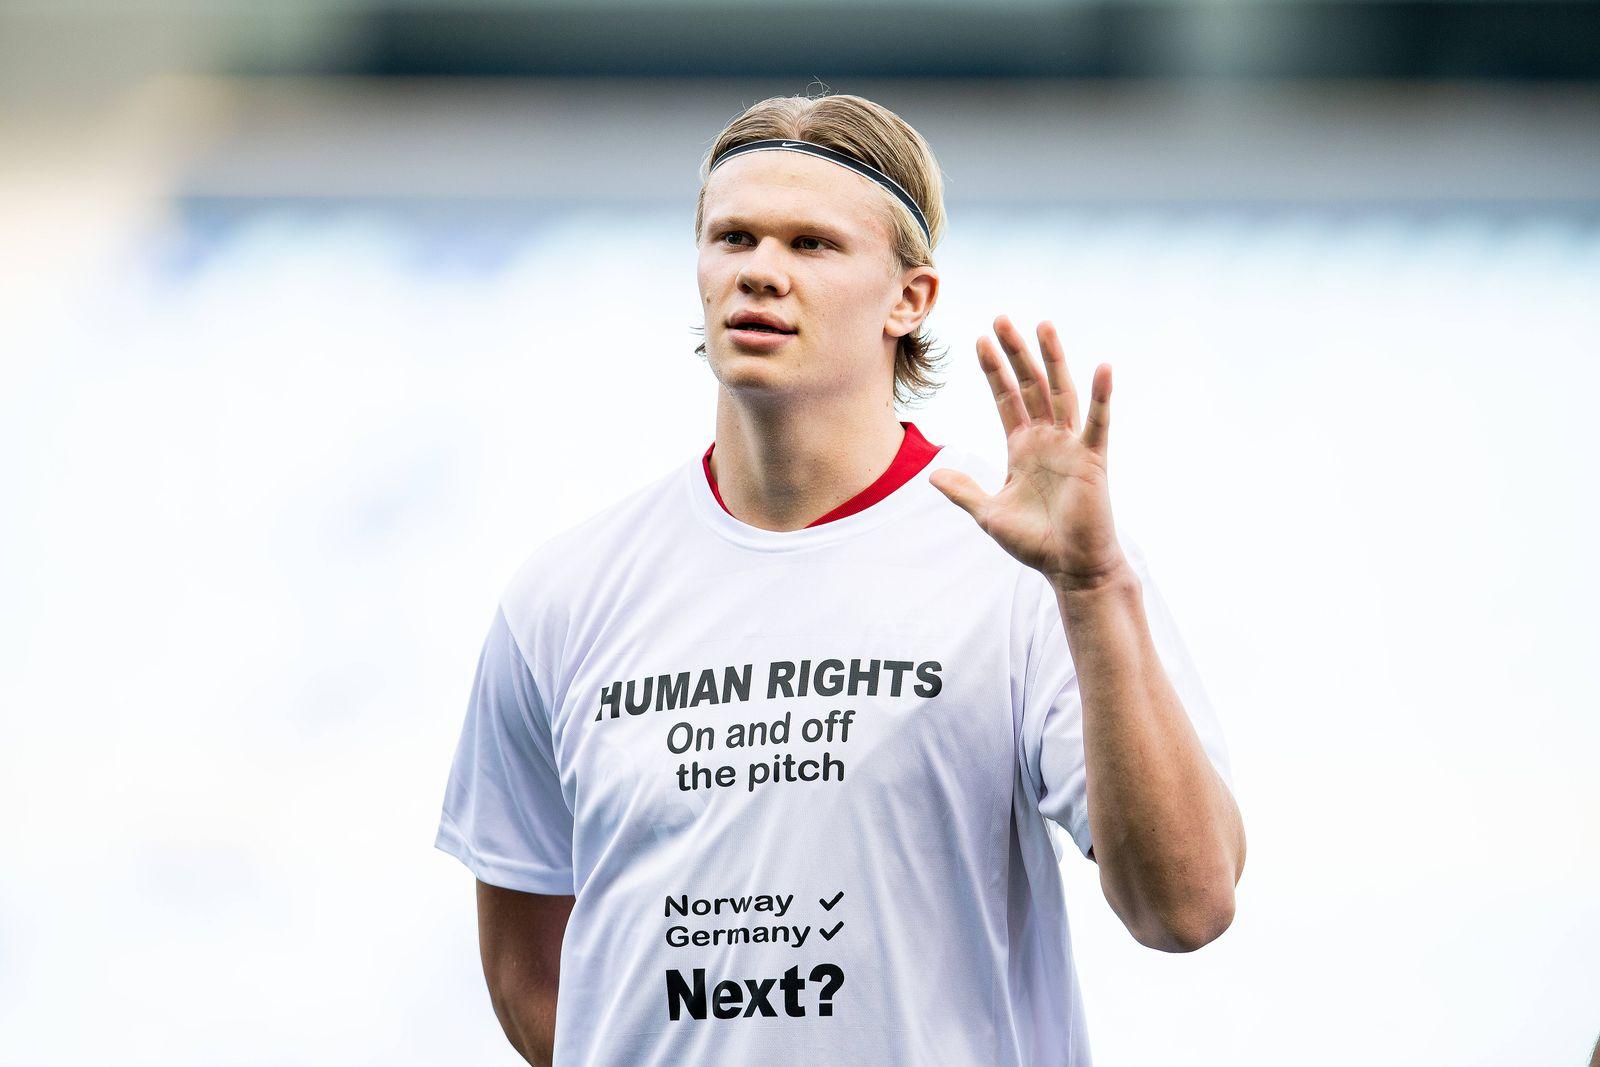 210327 Erling Braut Haaland of Norway ahead of the FIFA World Cup, WM, Weltmeisterschaft, Fussball Qualifier football m